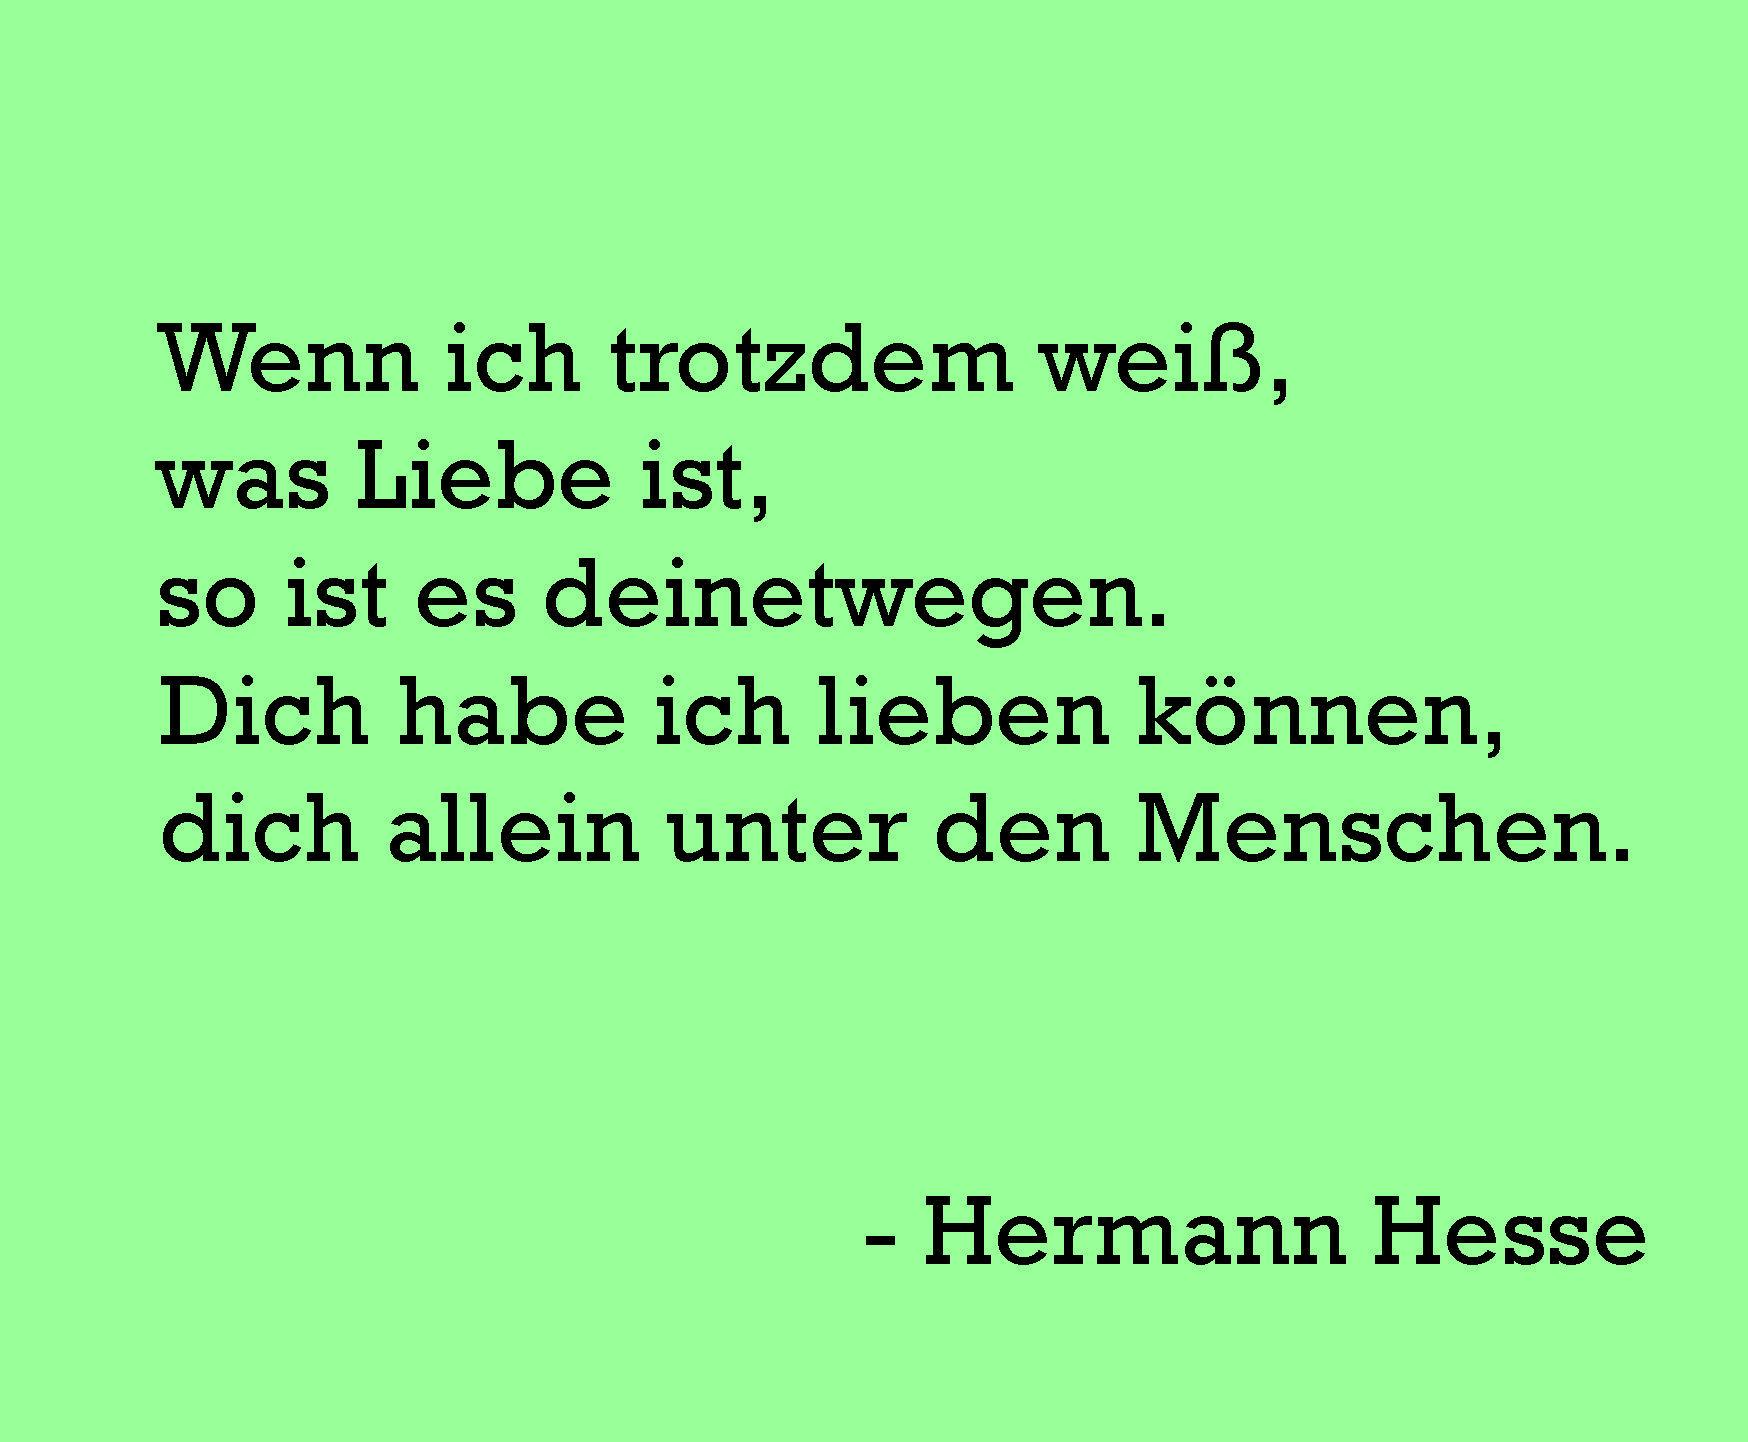 Hermann Hesse Zitate Leben Zitate Hesse Gluck 2019 07 22